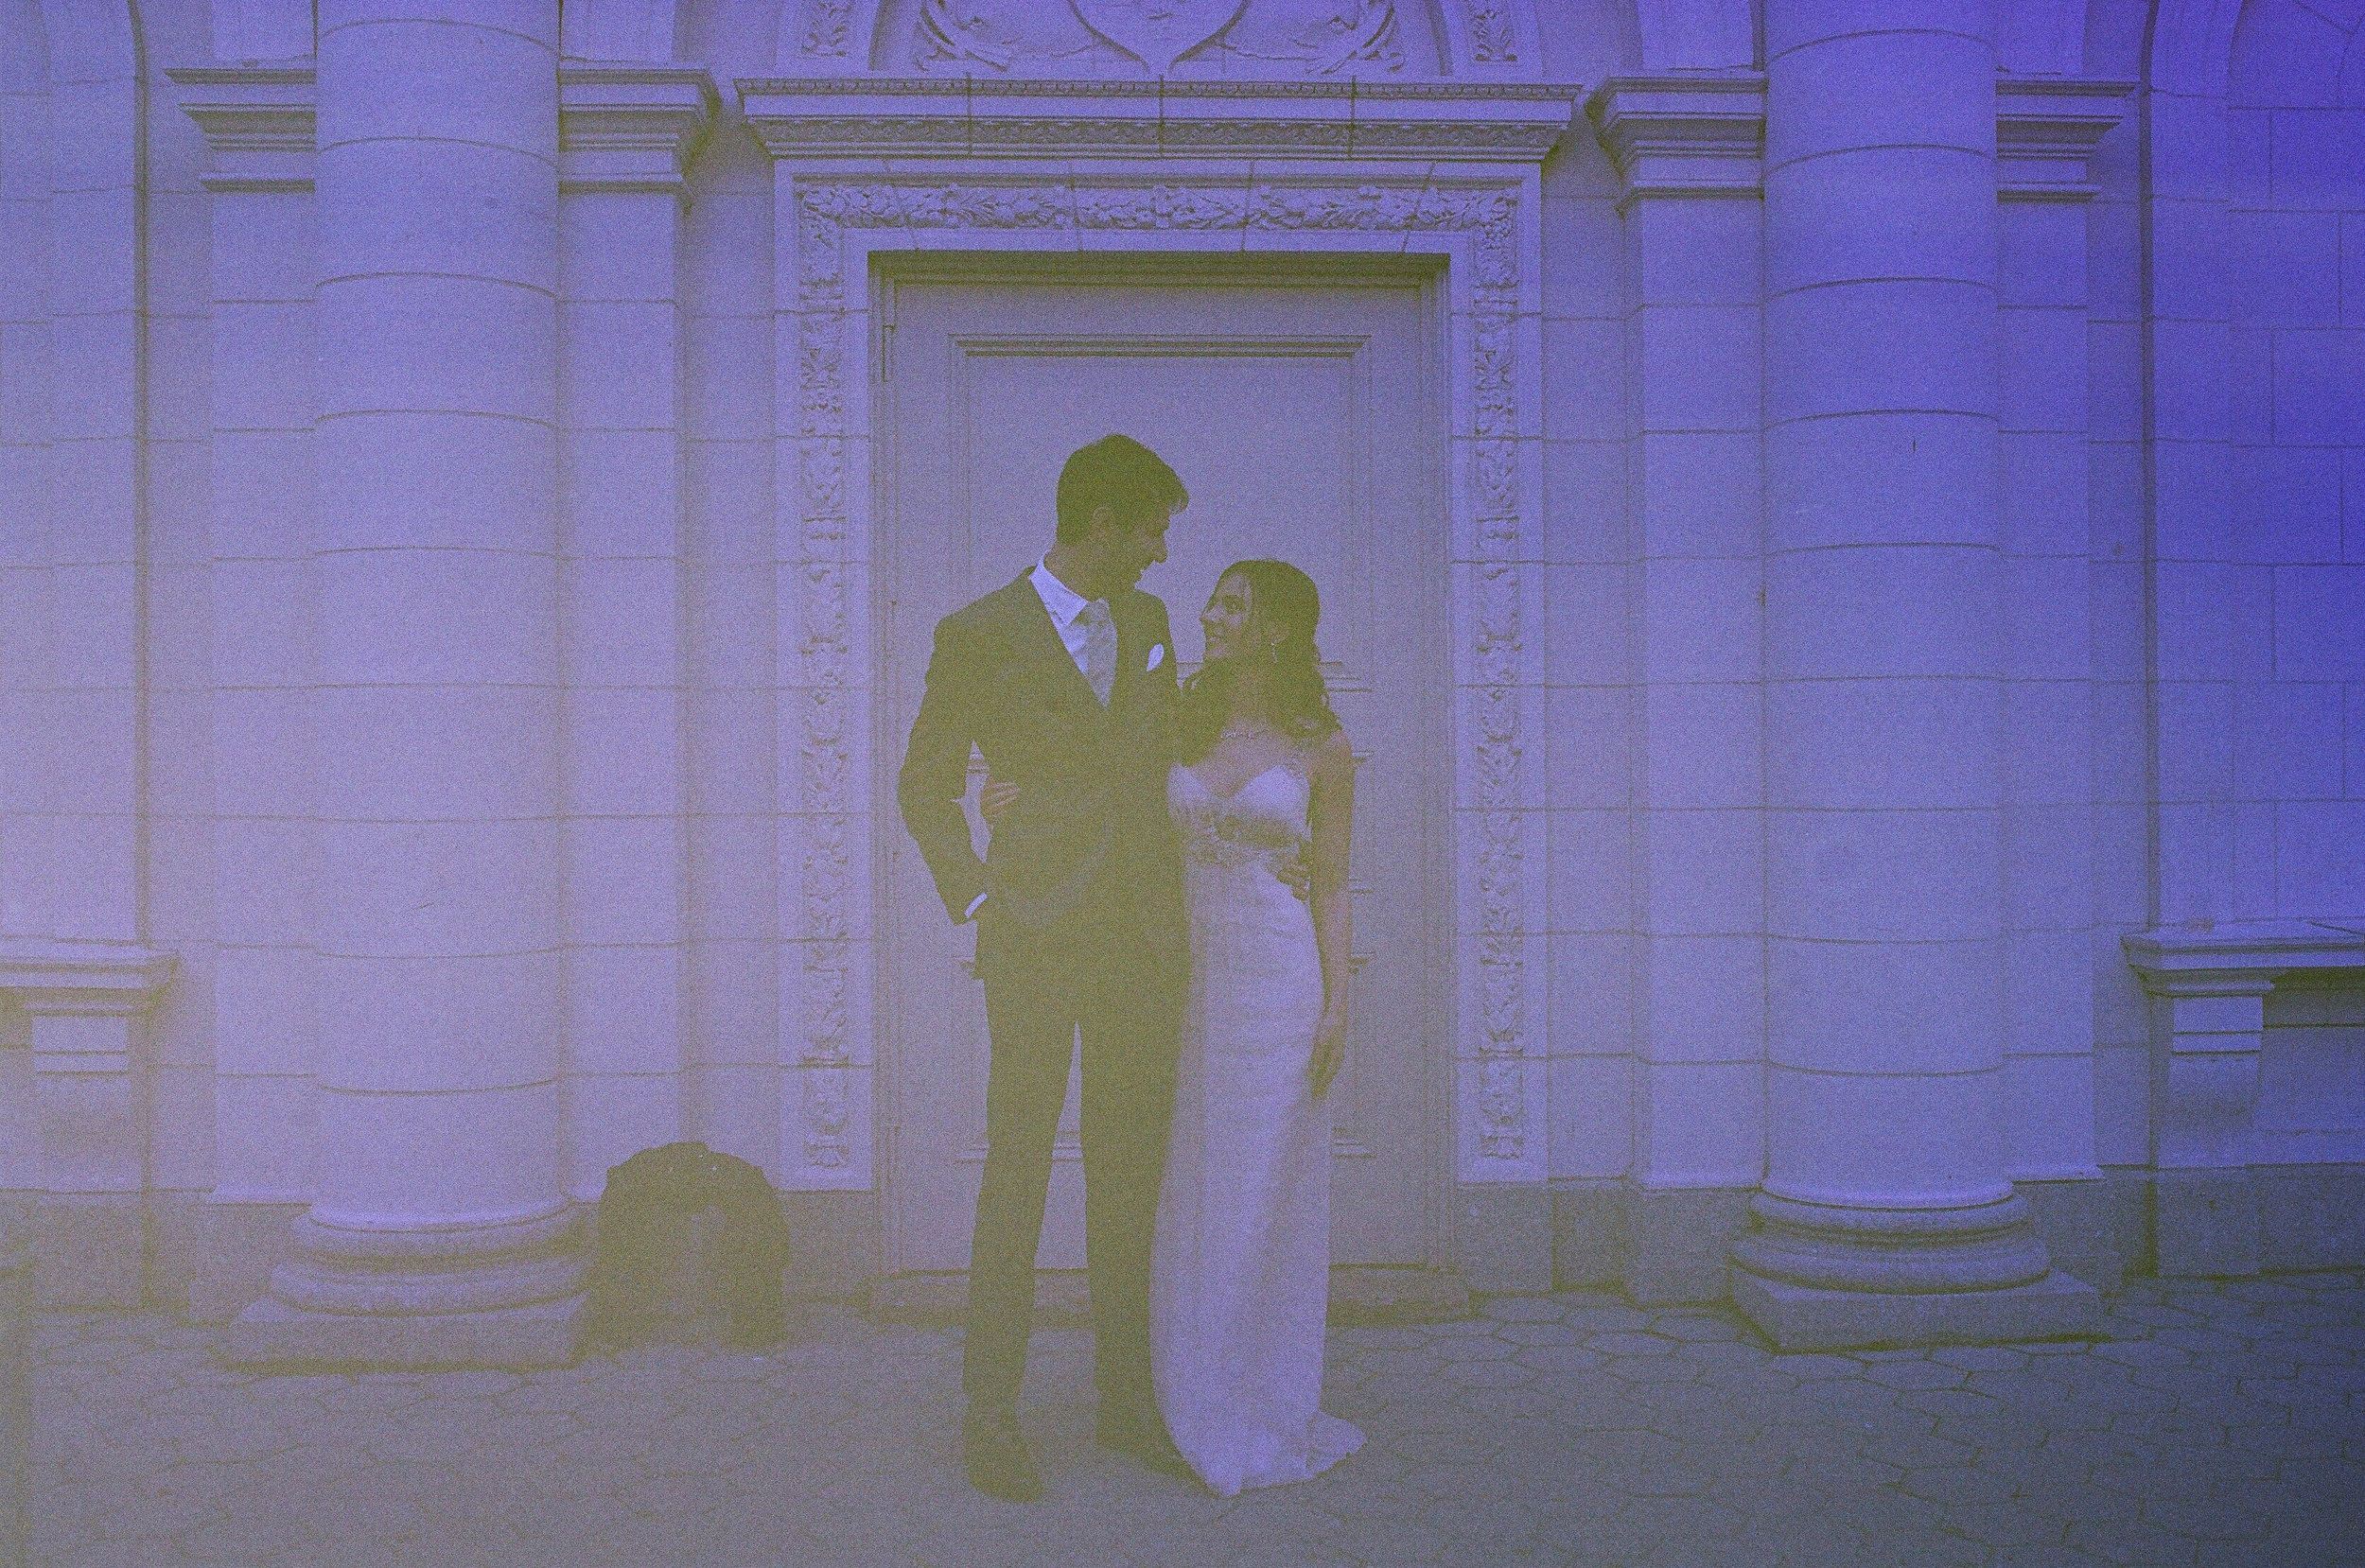 Brooklyn_Film_Wedding_Photographer_Chellise_Michael_Photography-16.jpg